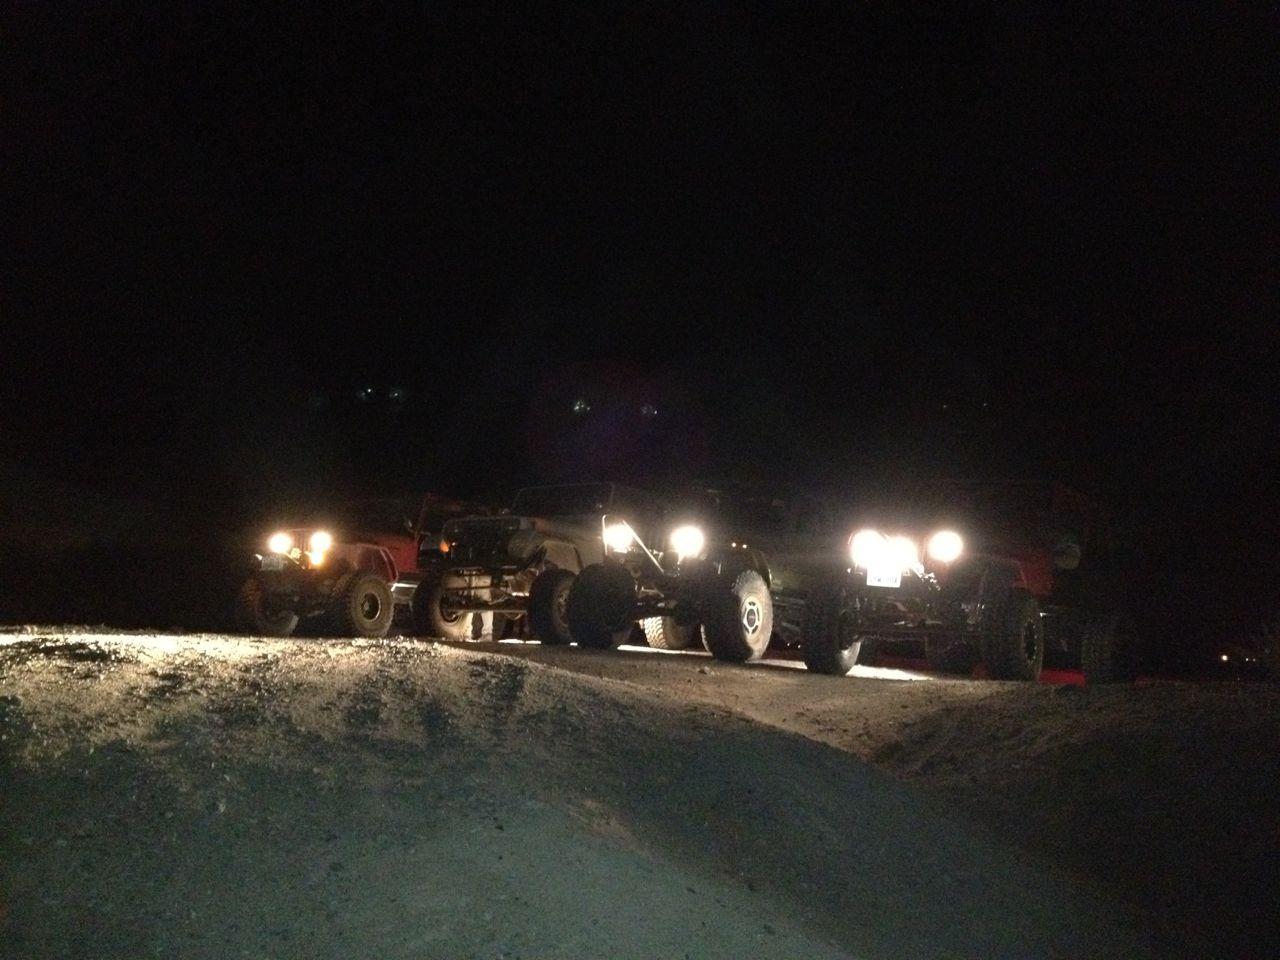 jeep-night-2.jpg